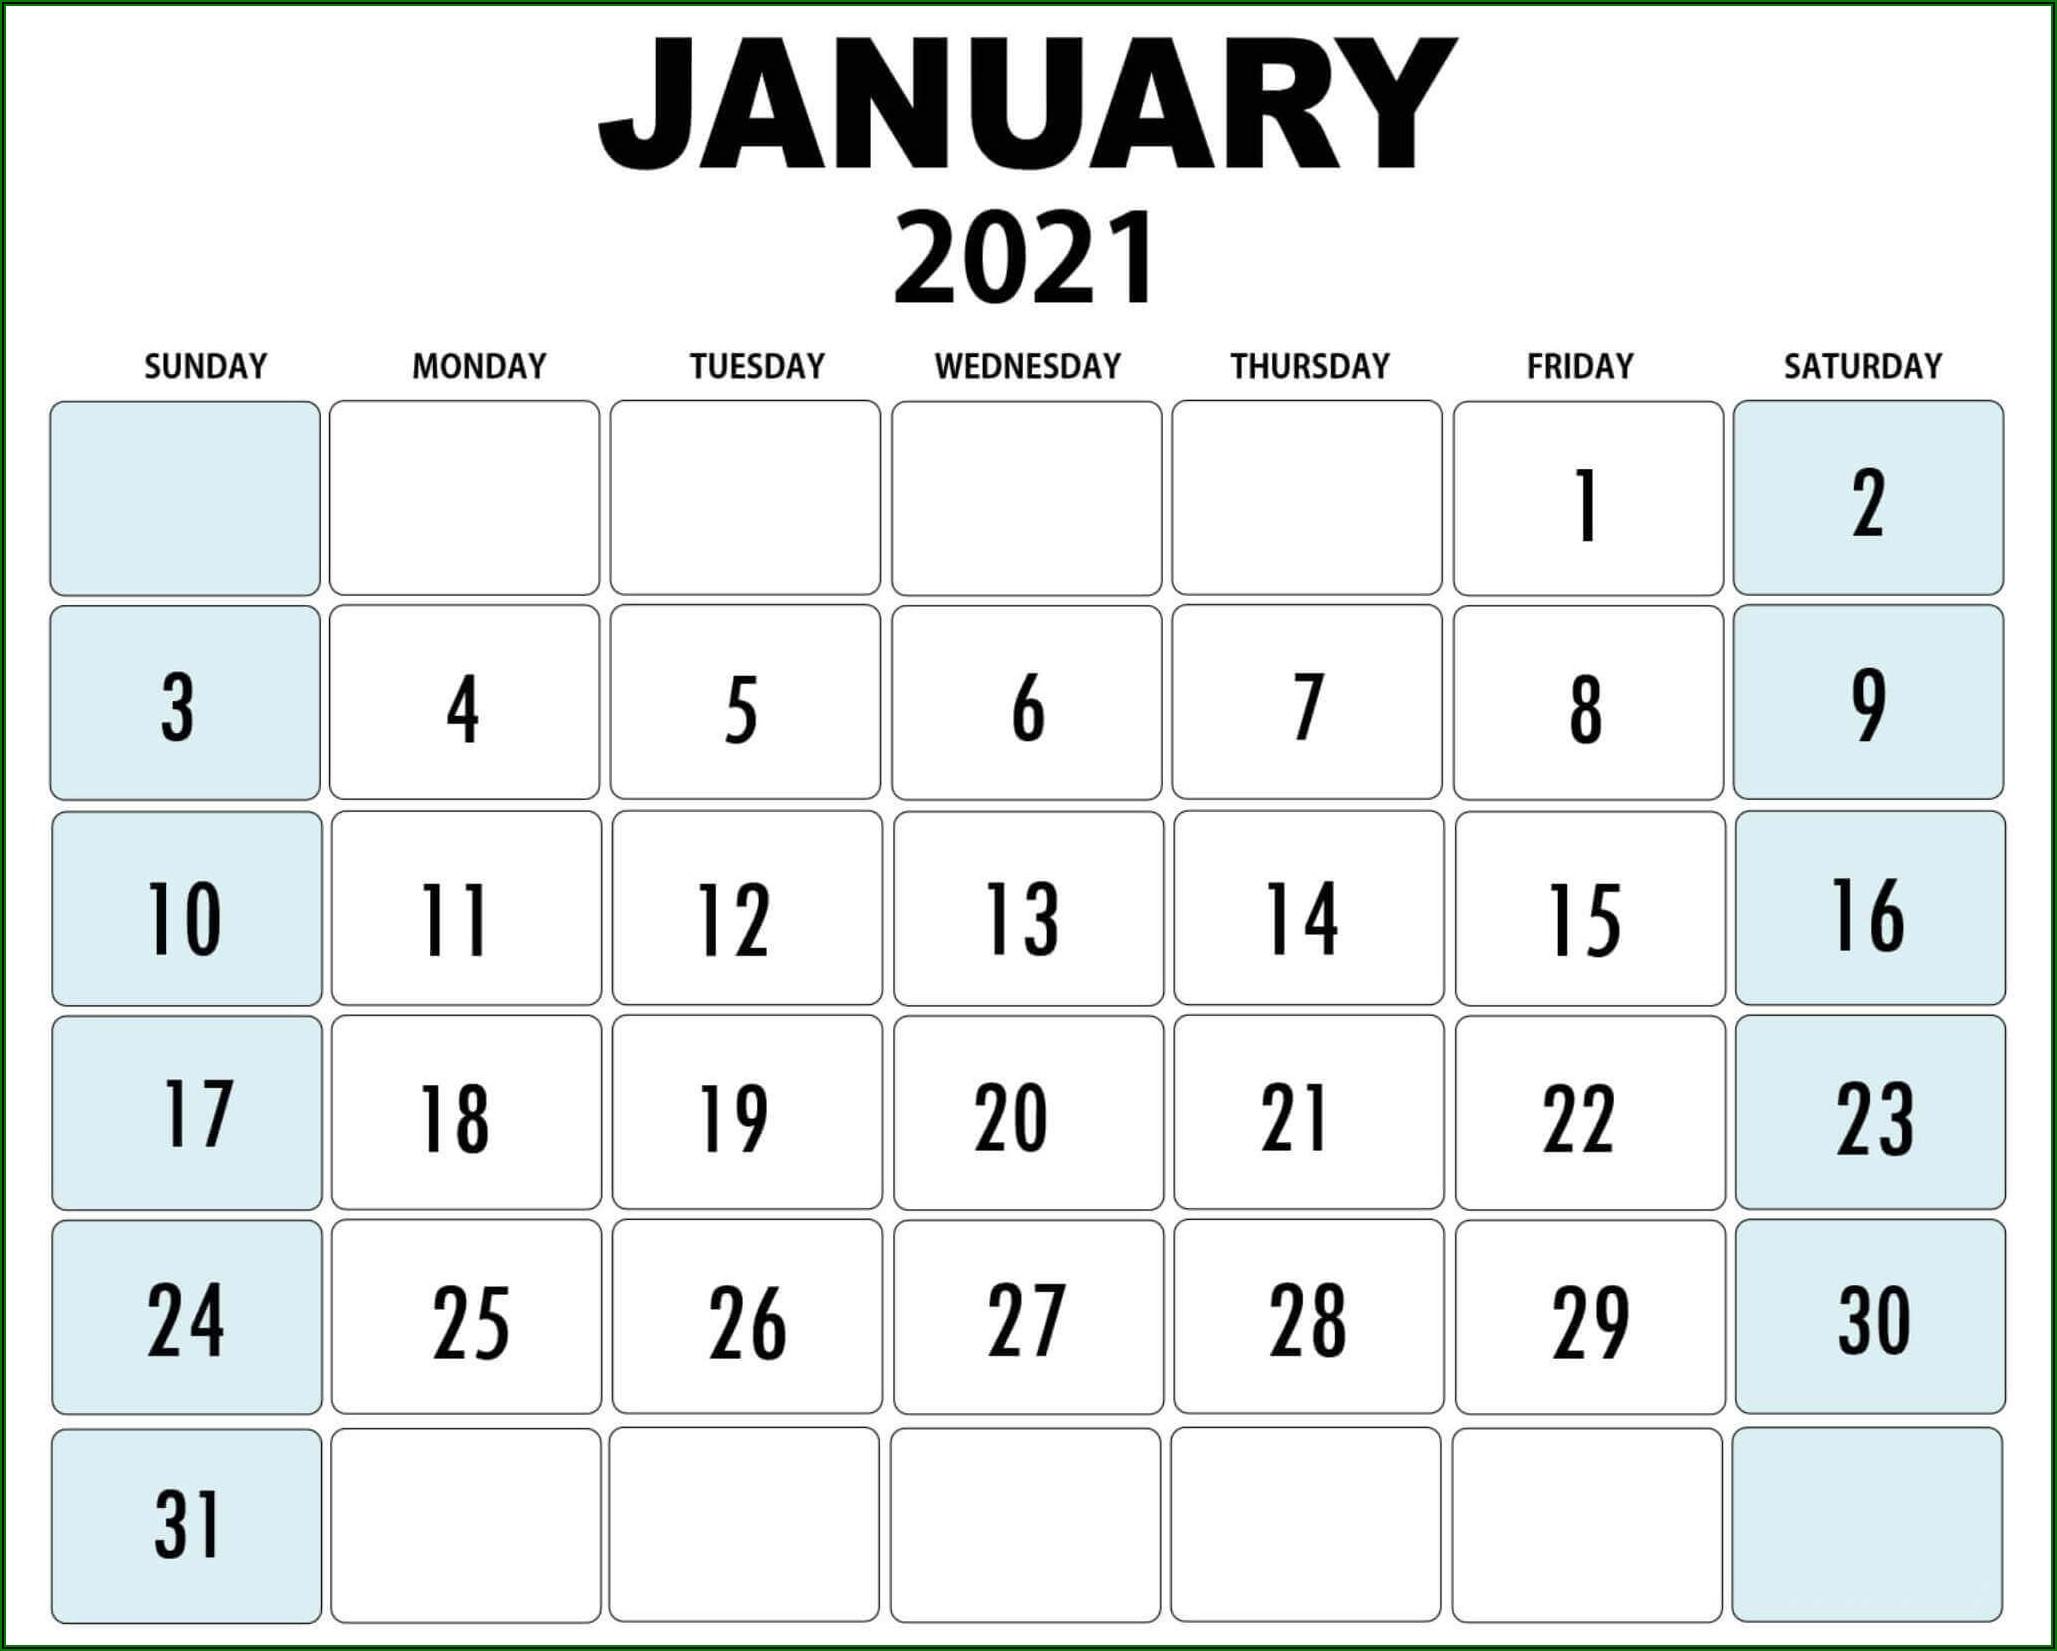 Large Print Blank Calendar Template